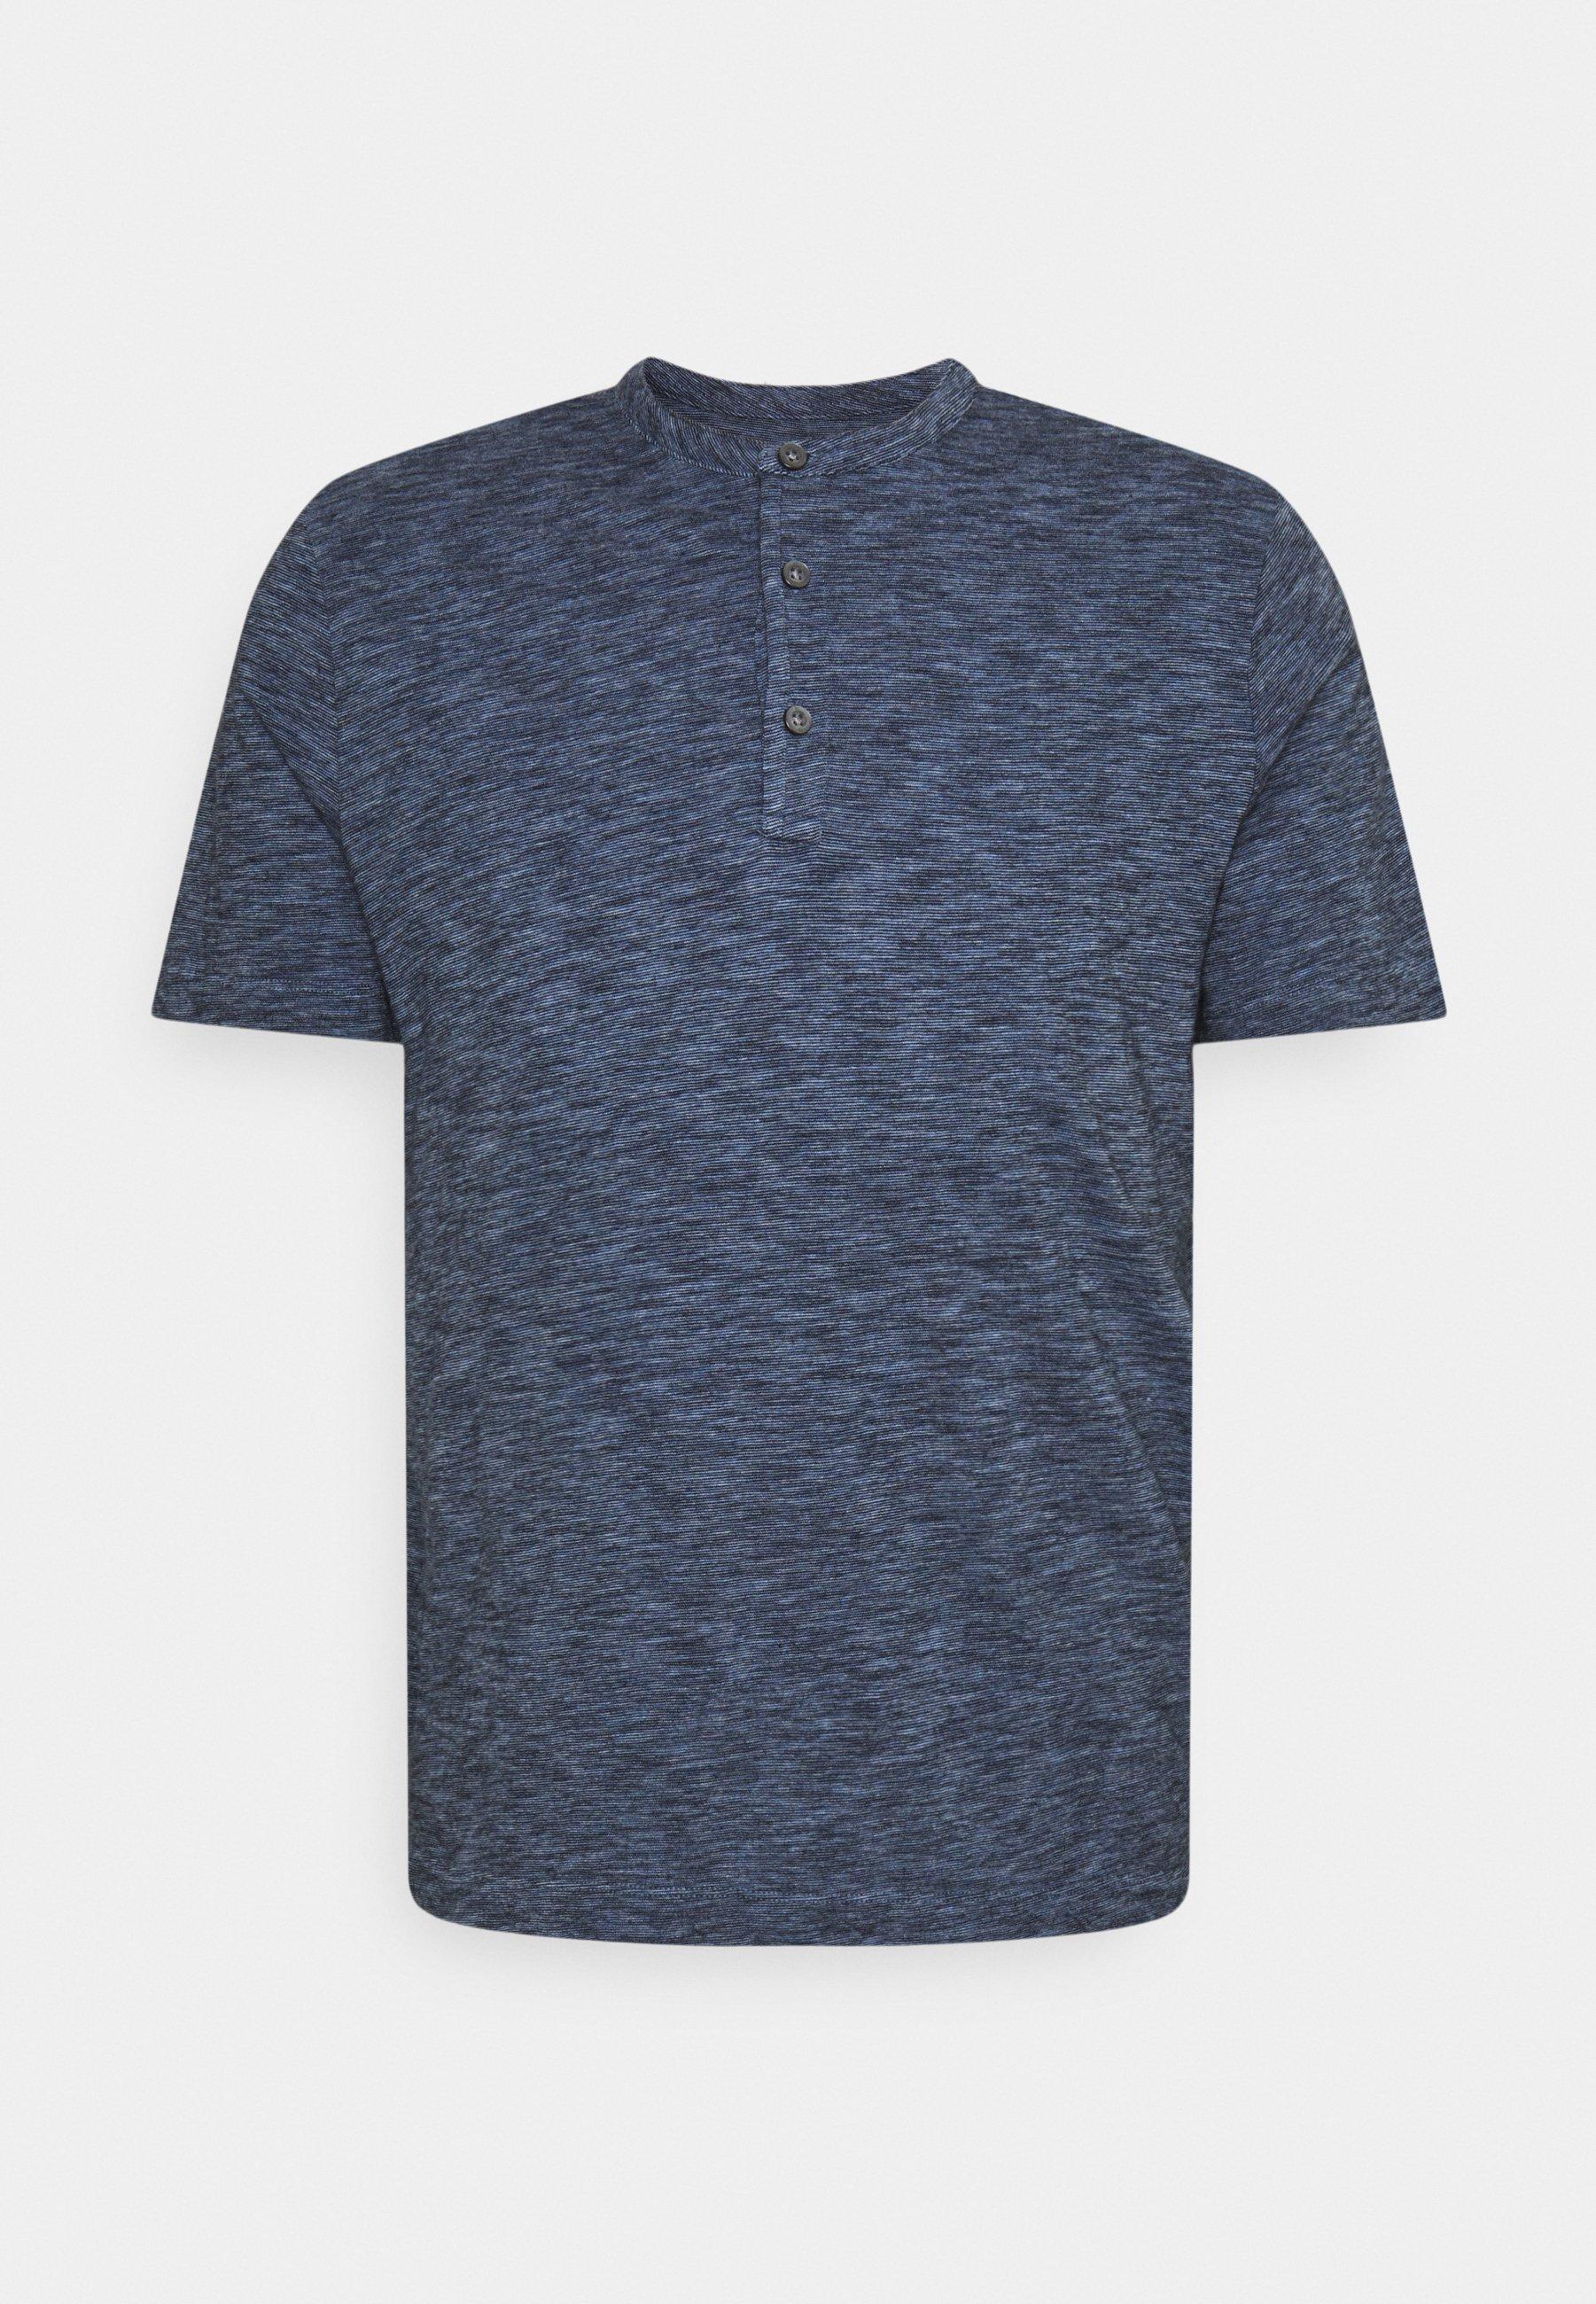 Uomo SOFTWASH SLUB HENLEY - T-shirt con stampa